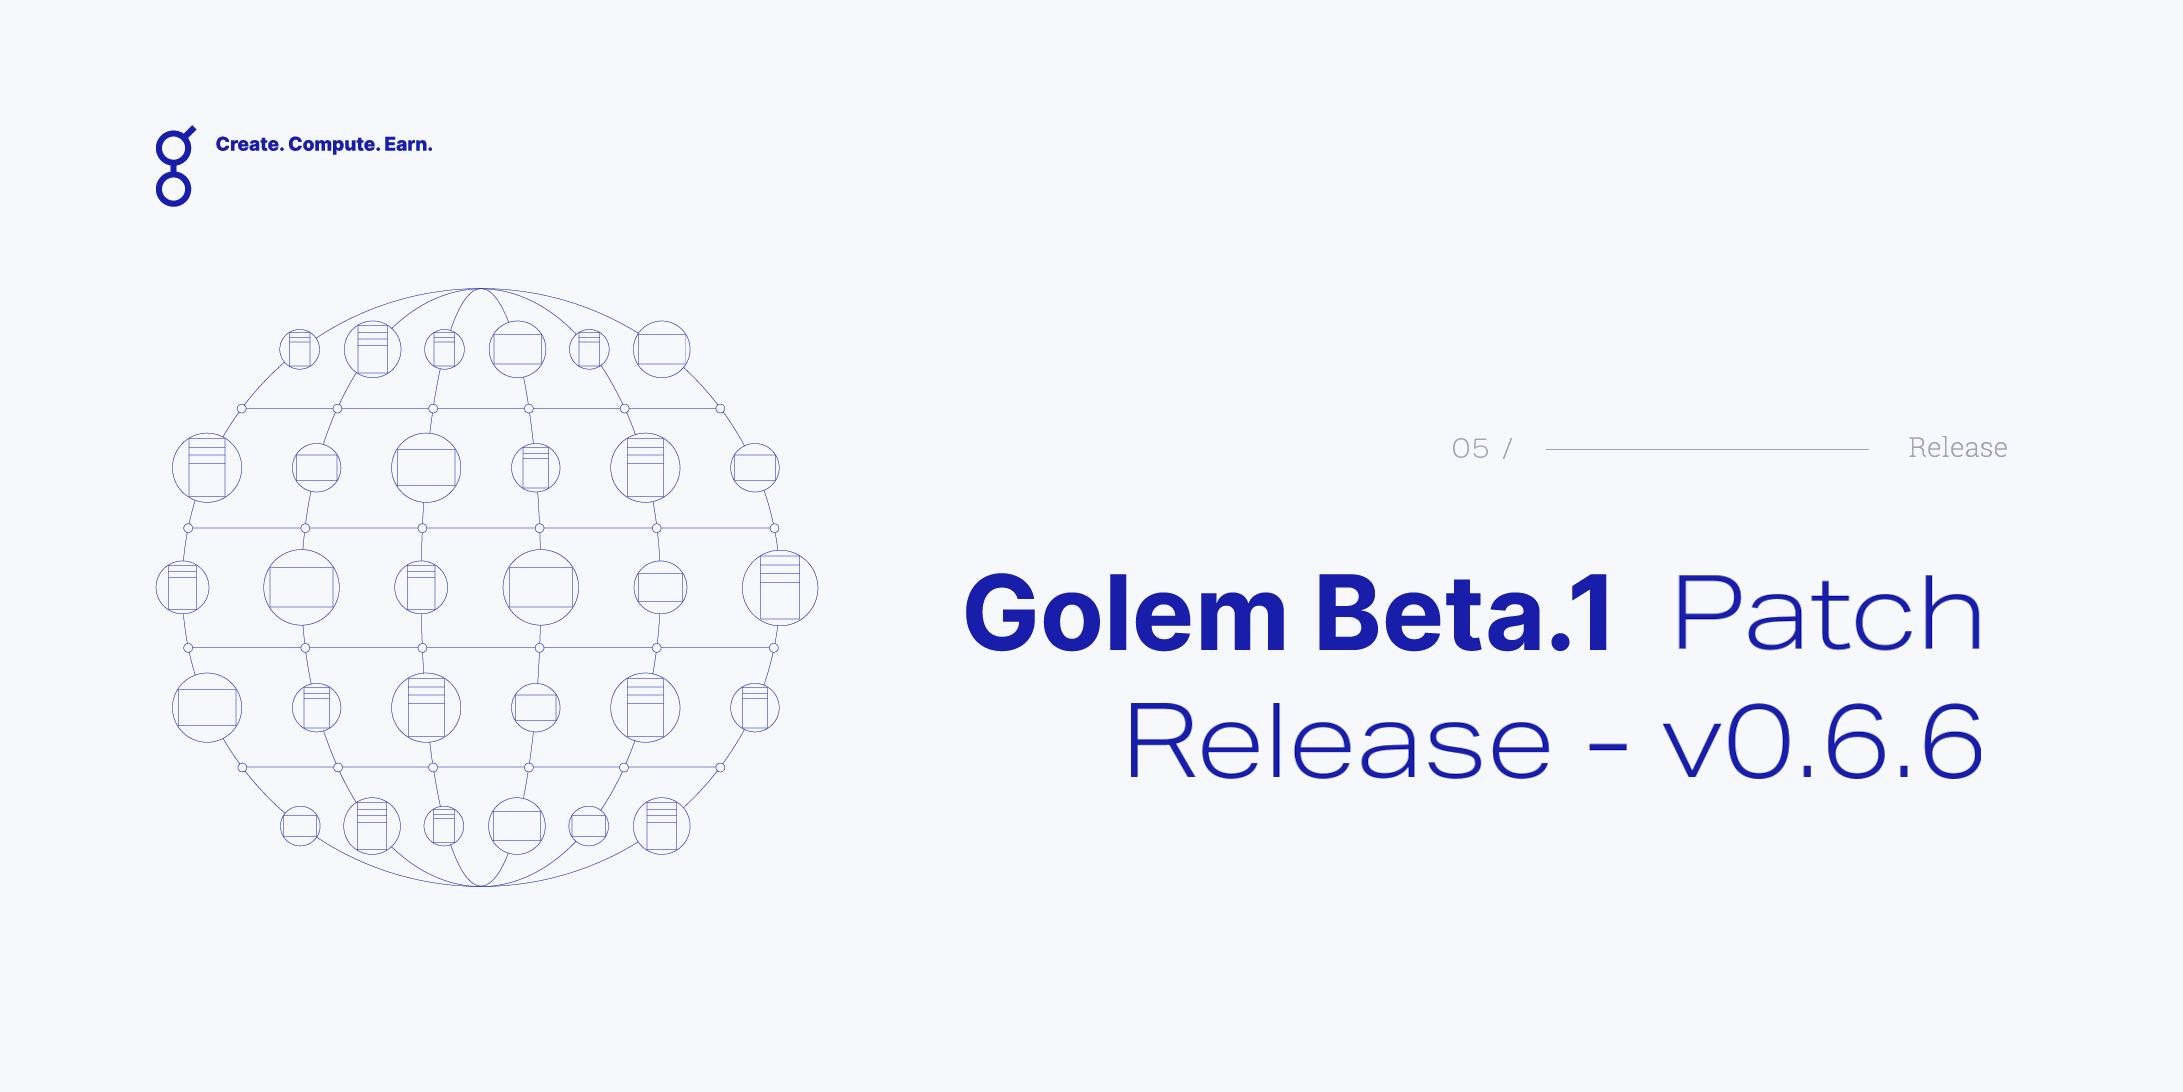 Golem Beta 1 Patch Release - v0.6.6